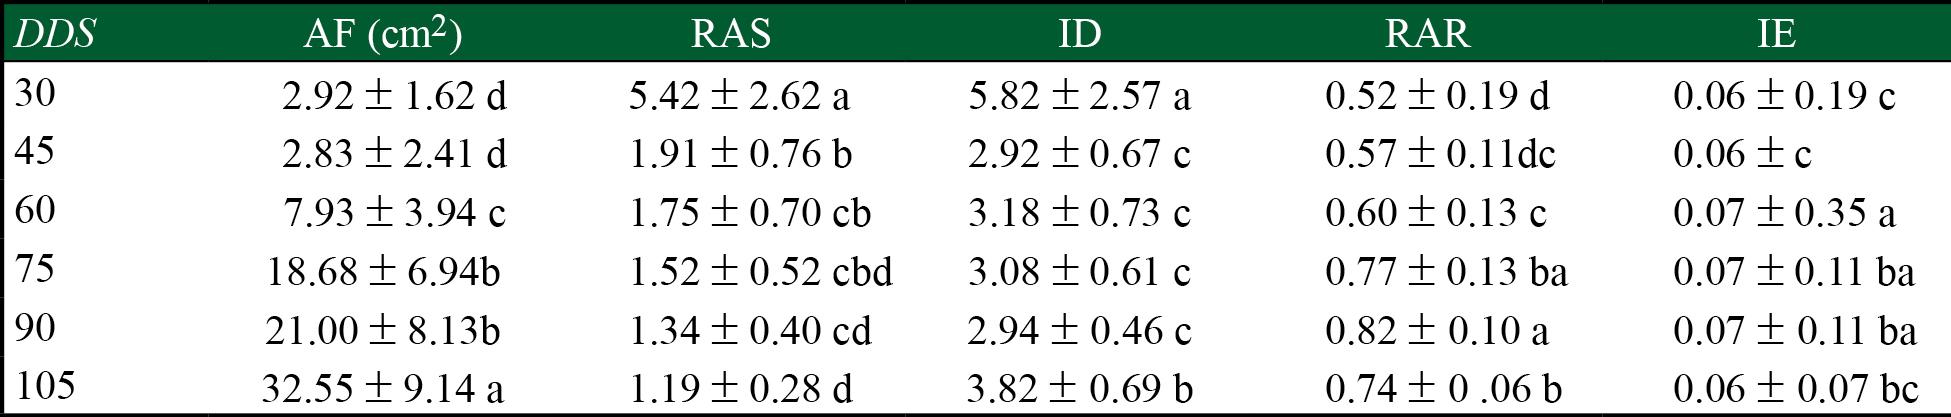 Características de árboles de Leucaena esculenta de diferentes progenies, transcurridos 105 días de crecimiento en invernadero